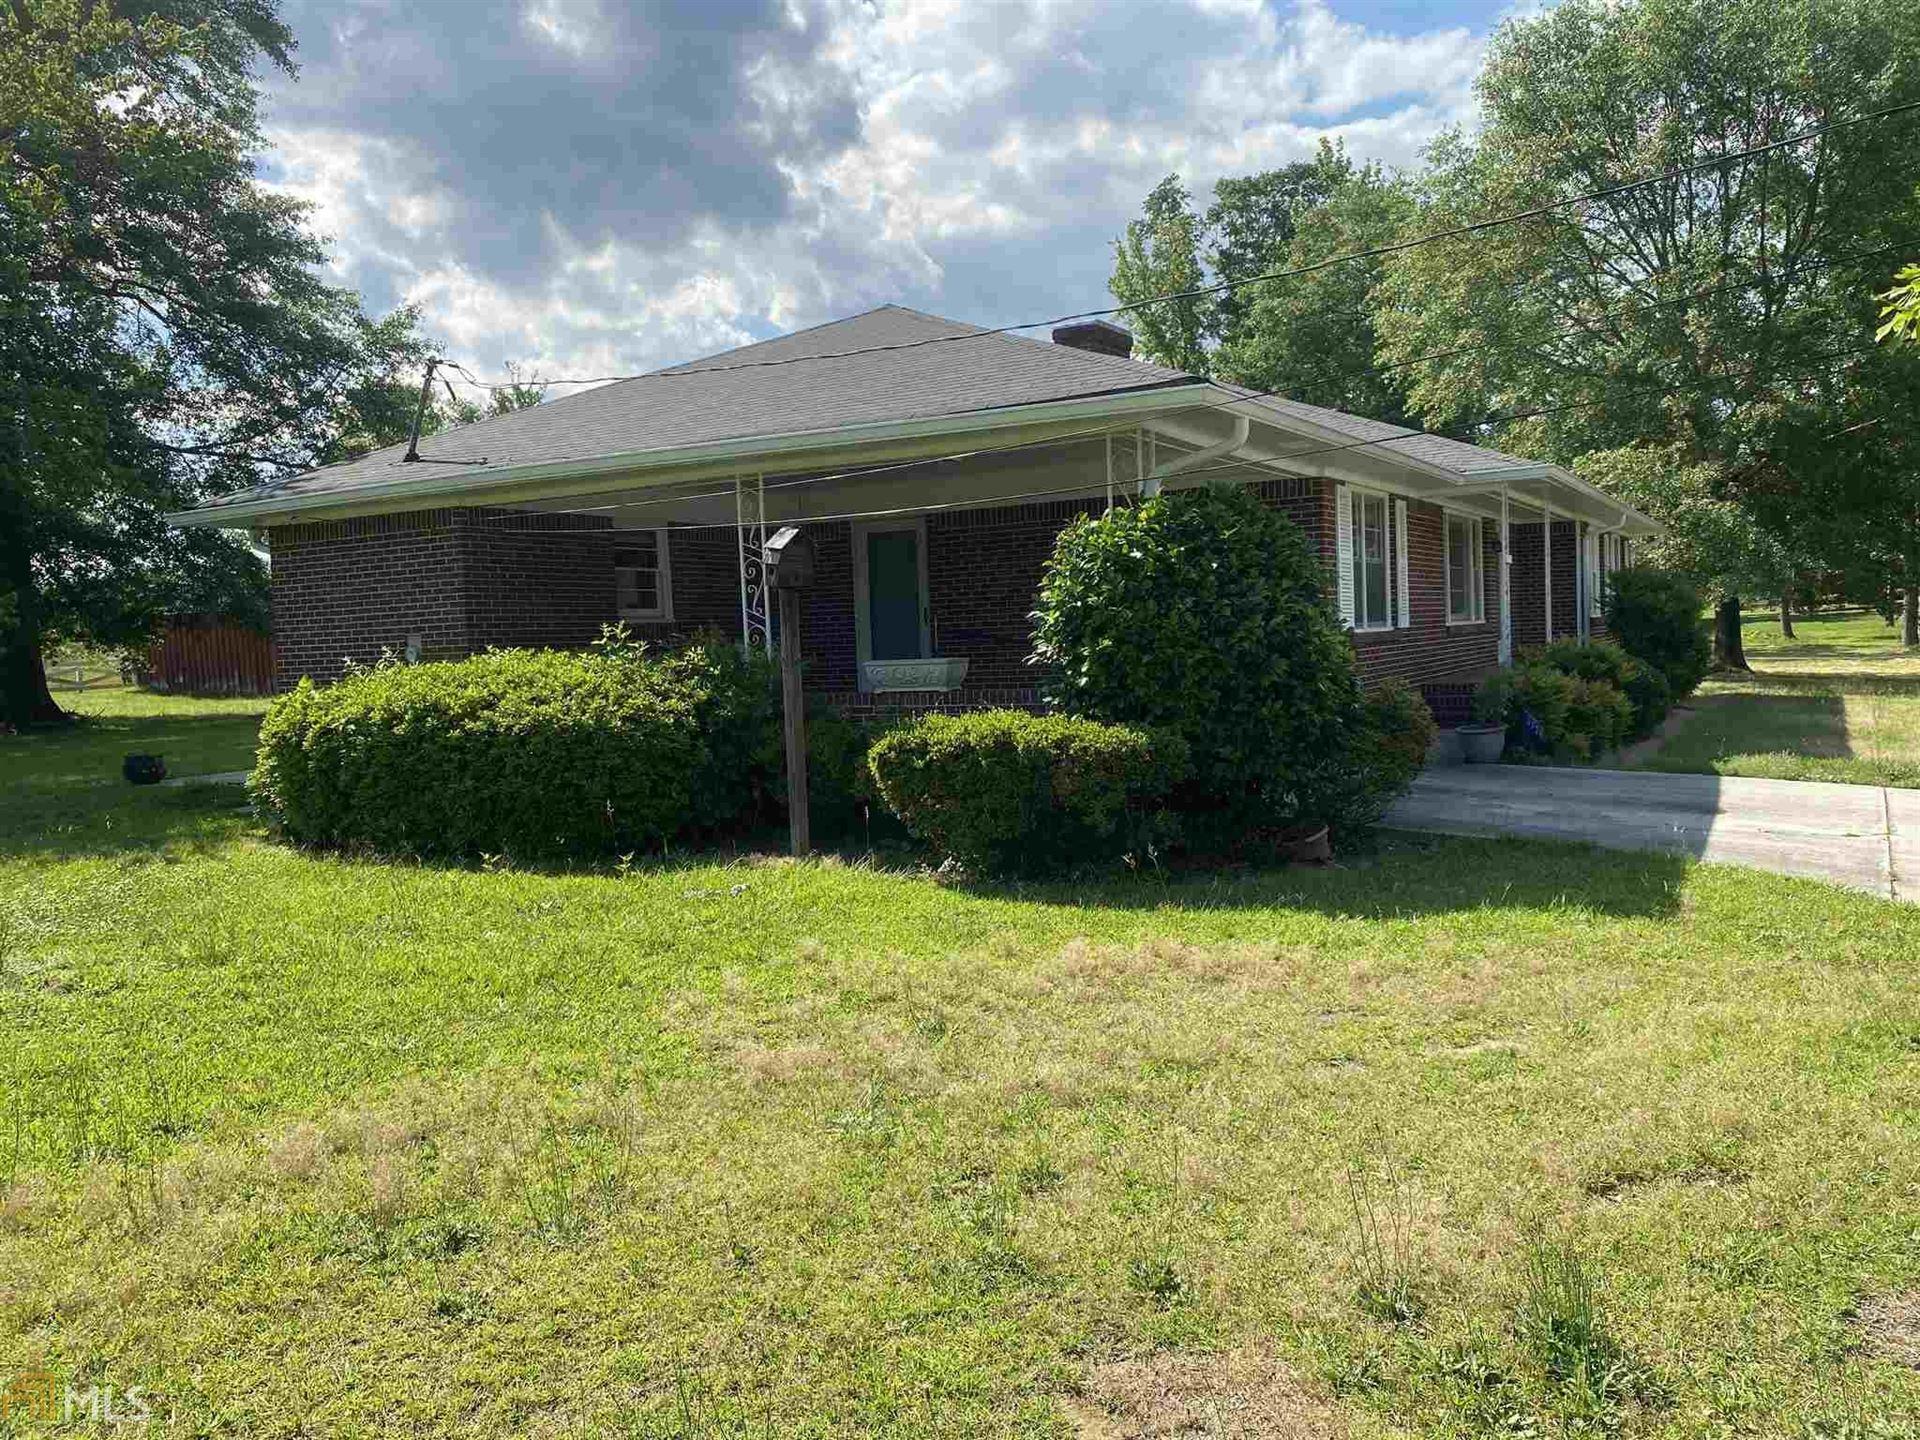 3729 Loganville Hwy, Loganville, GA 30052 - #: 8798967